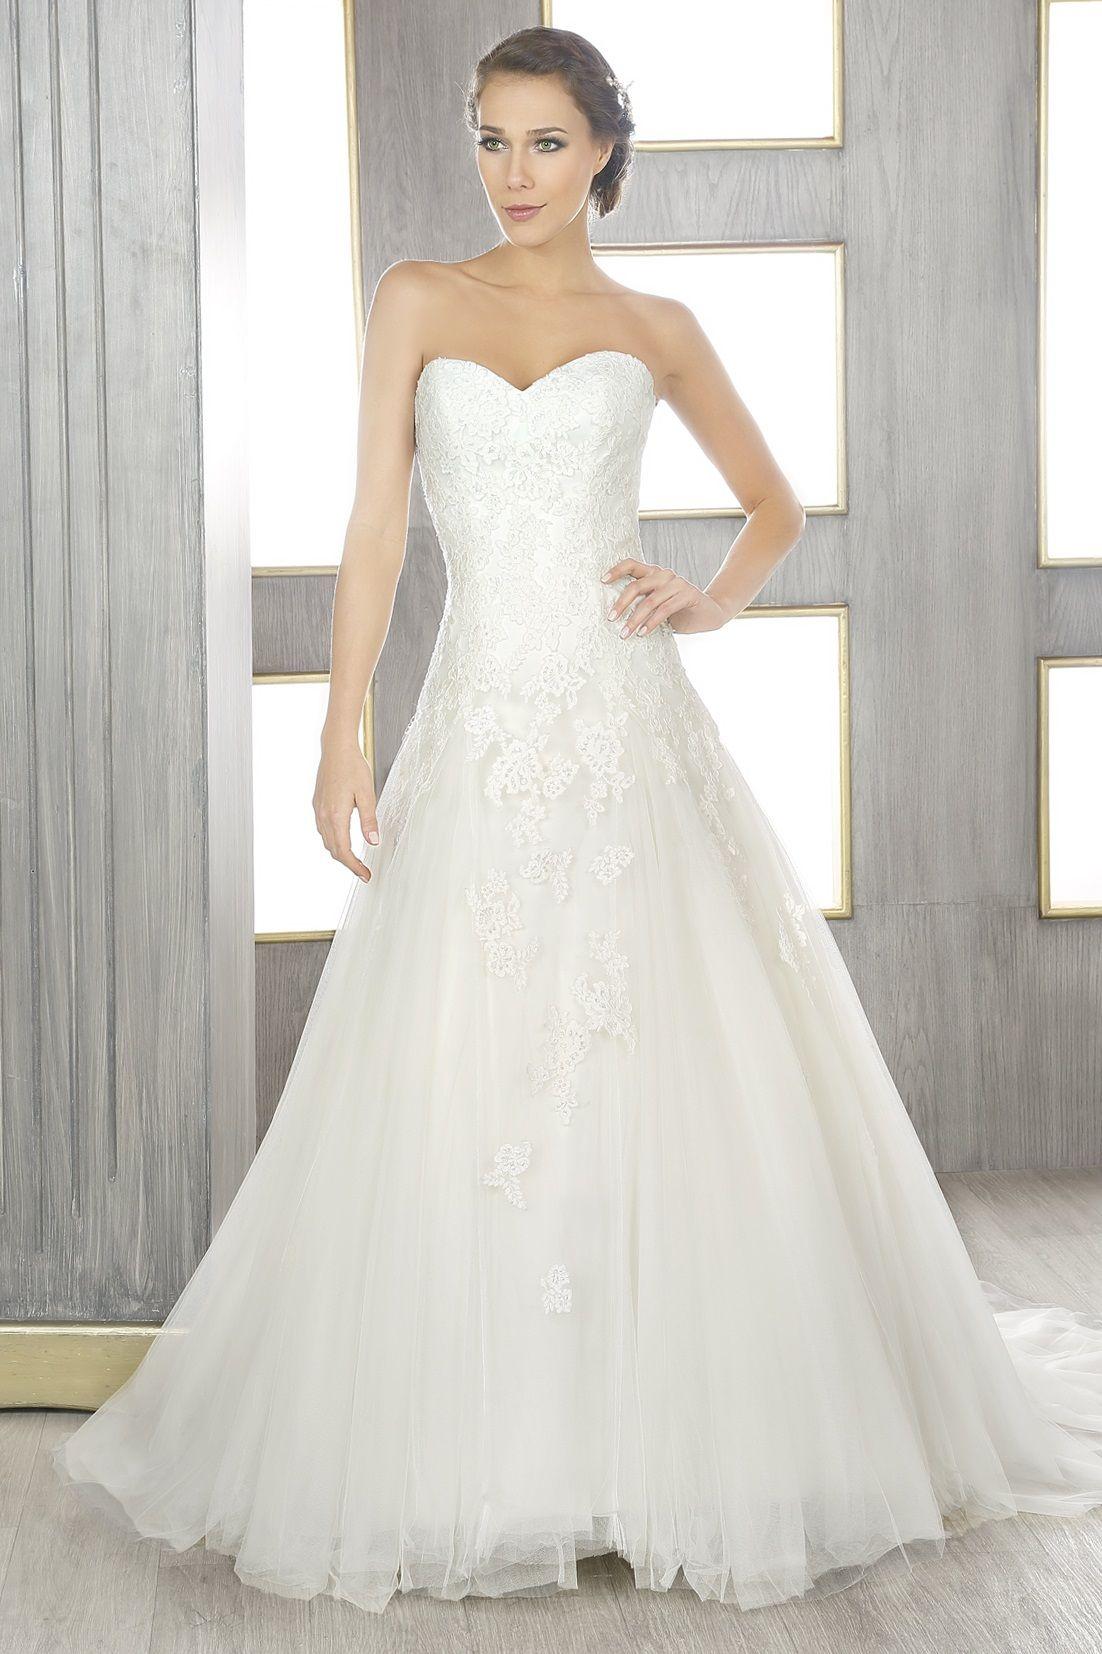 Modelo Tereza #Wedding #Dress #WeddingDress #NoviaEssence #Essence ...